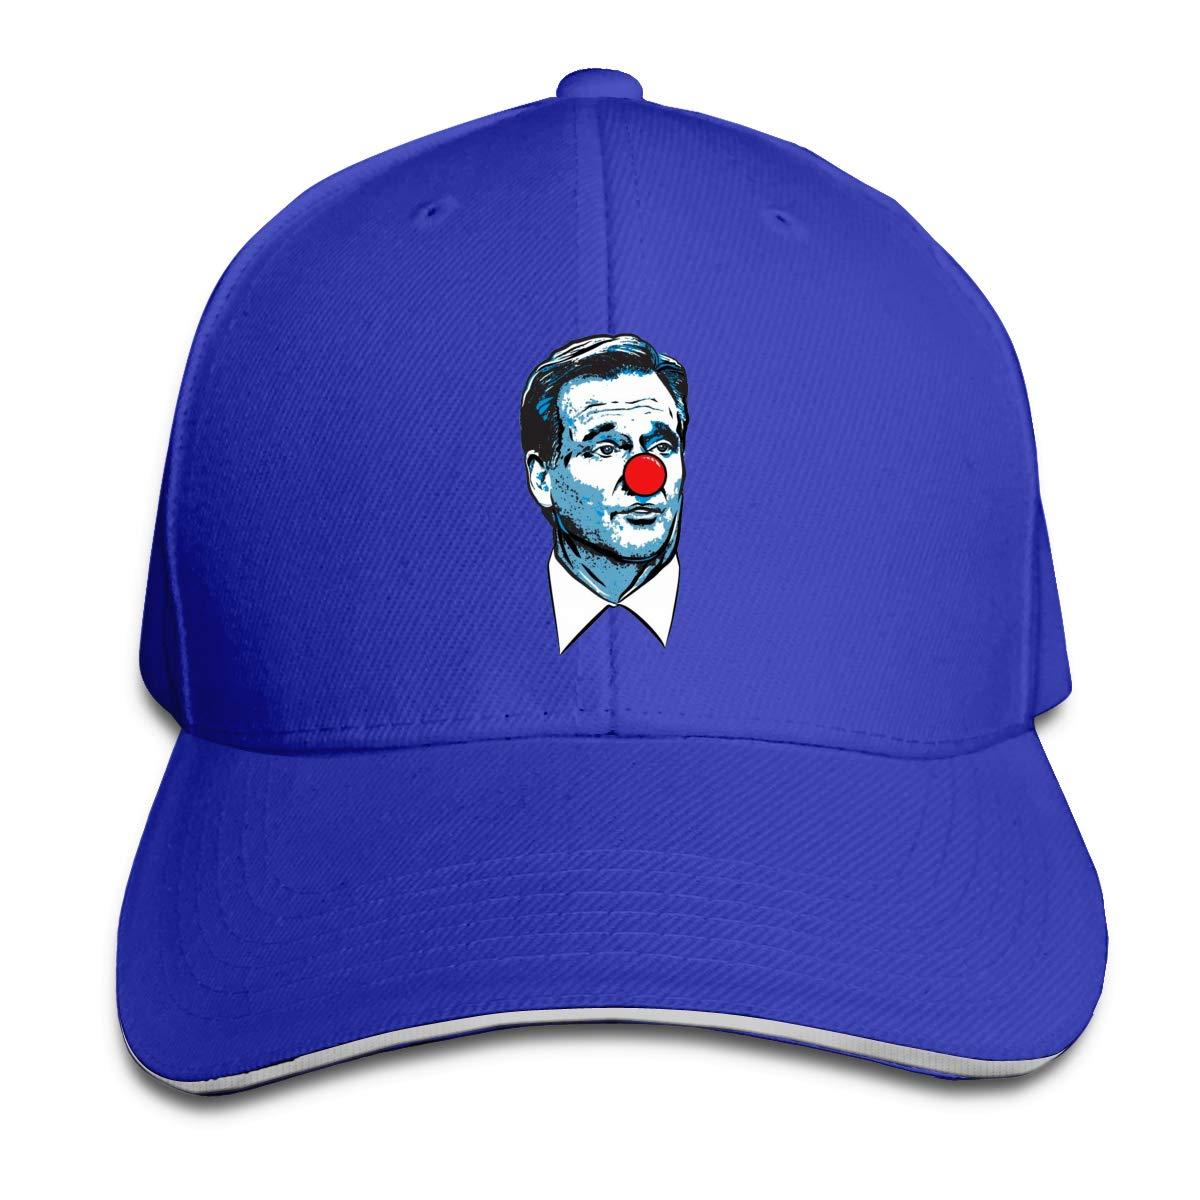 Matt Patricia Roger Goodell Clown Caps Sports Trucker Caps Pattern Strapback Hat for Men//Women